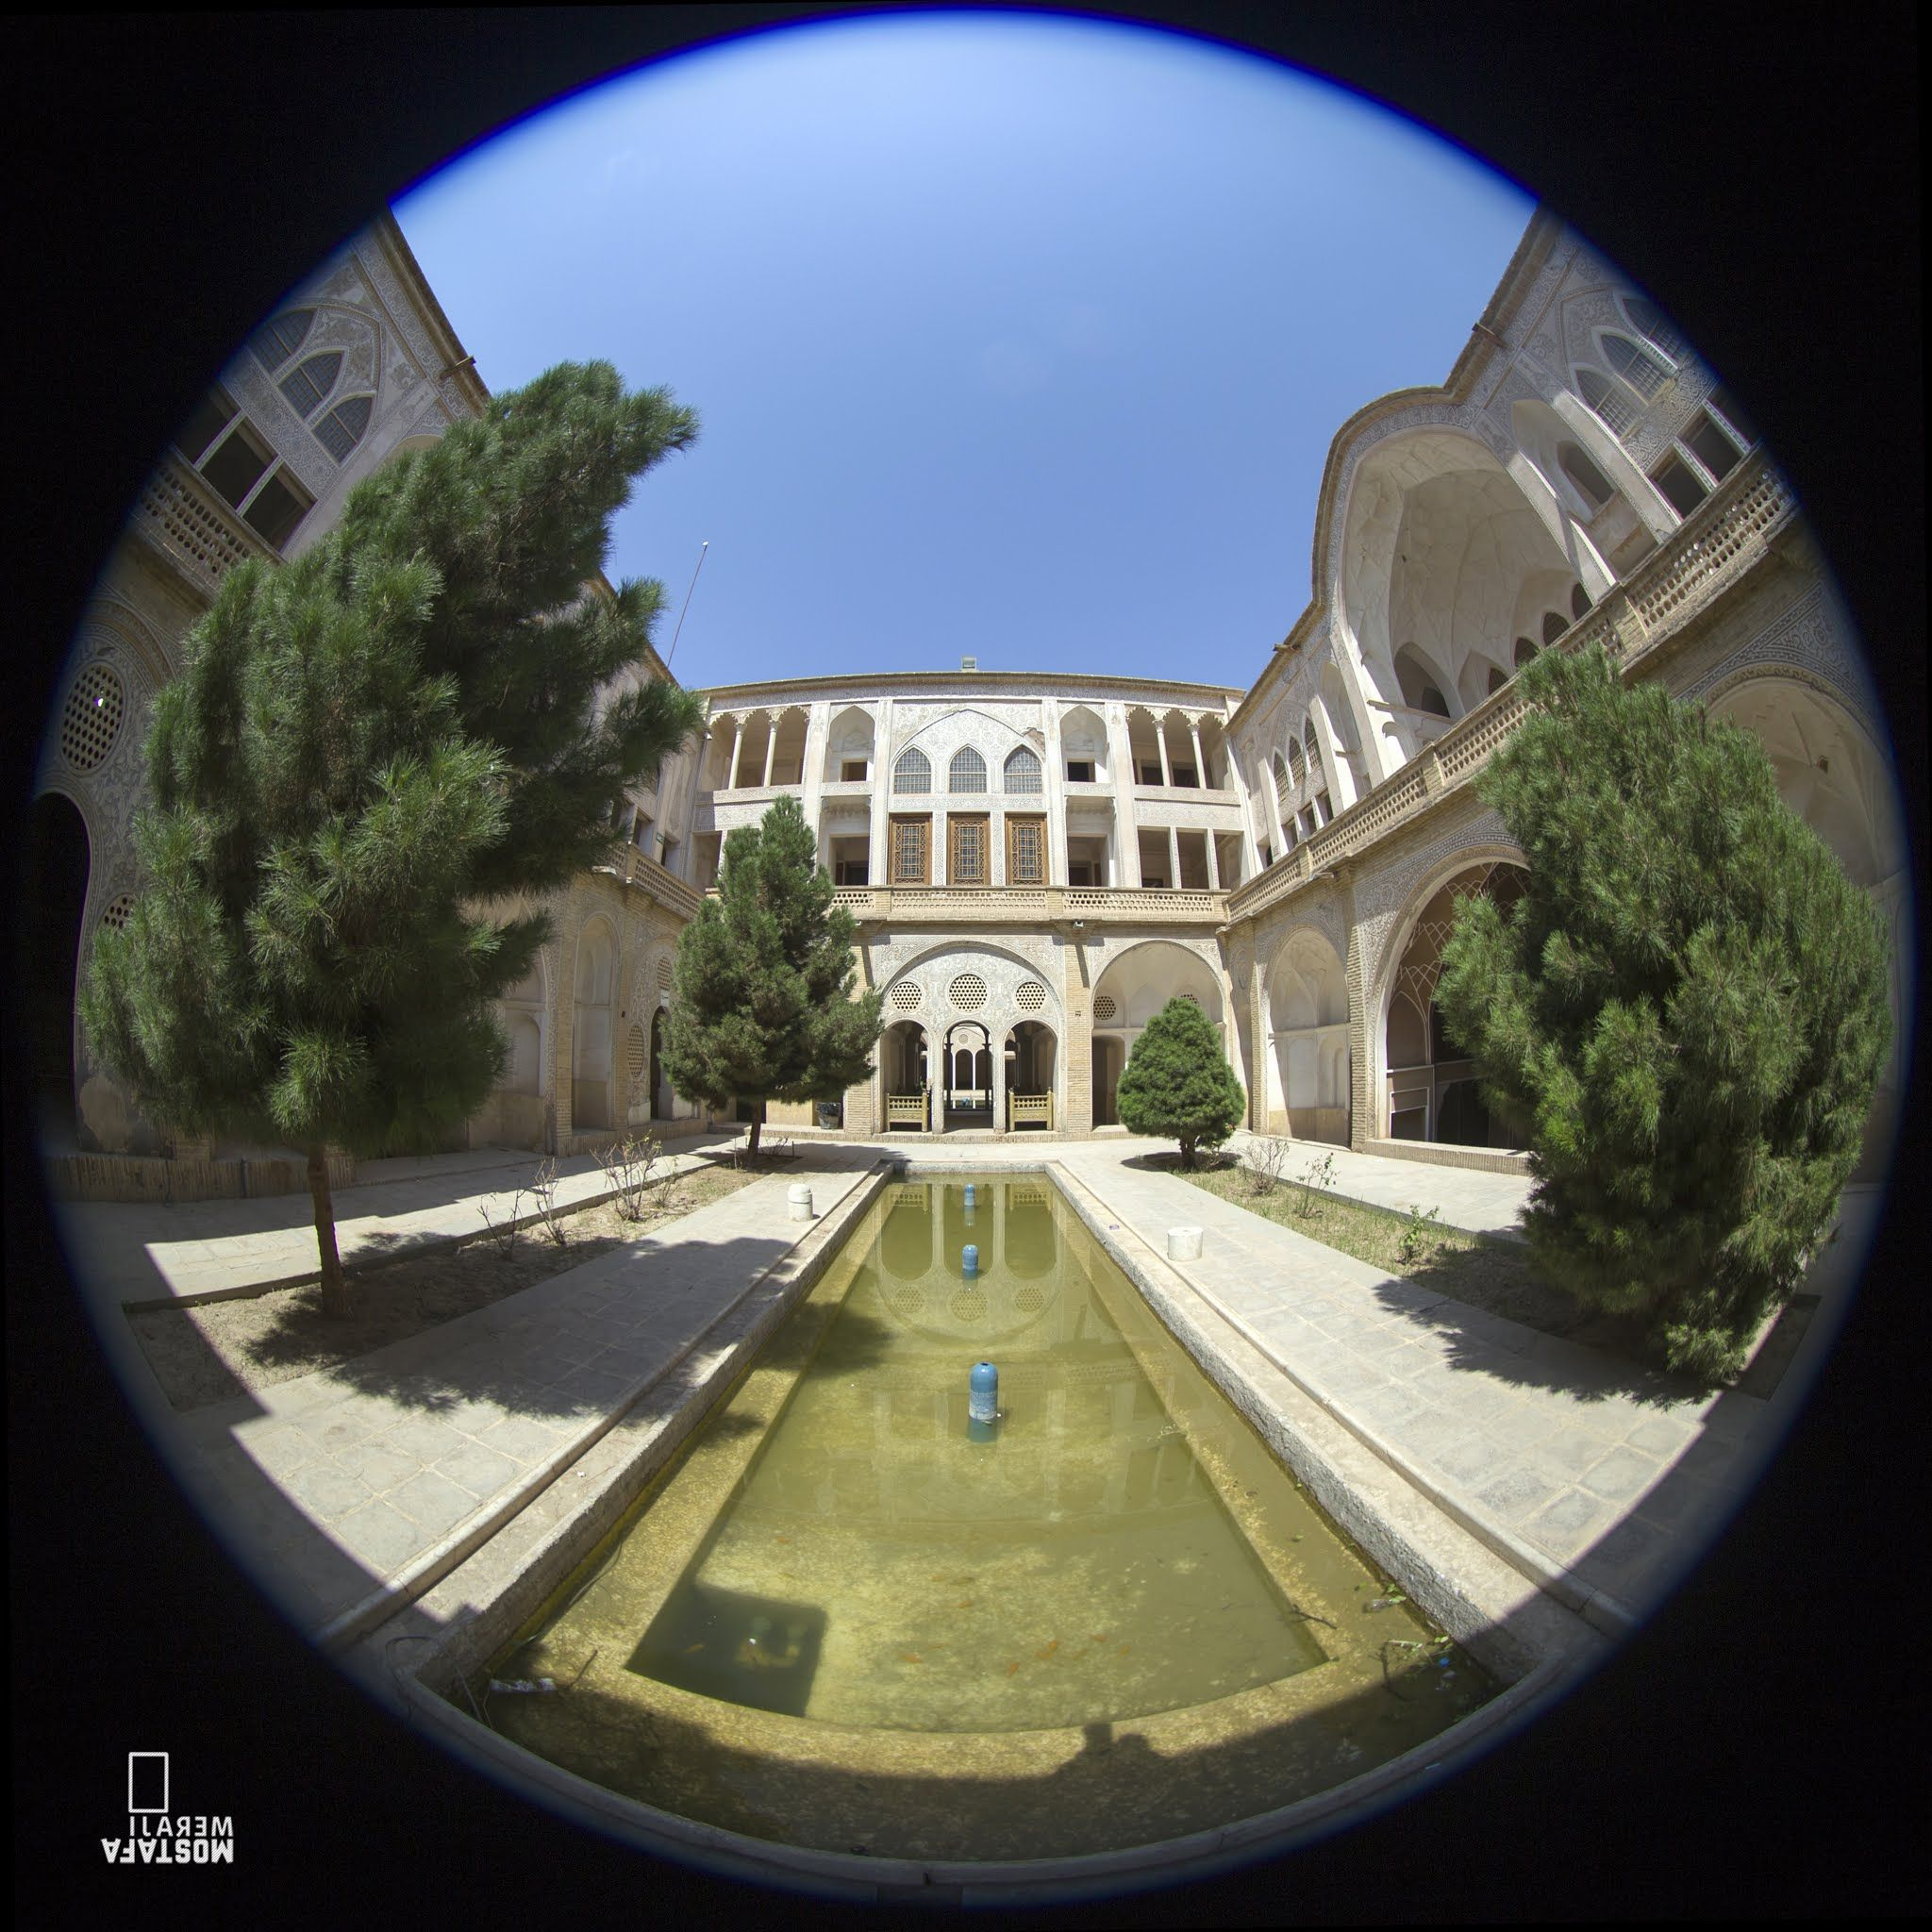 Fisheye Lens Canon Fisheye Lens Iran Mostafa Meraji Monument Monuments Beautiful Iran Architectural Photograph Photo House Styles Mansions